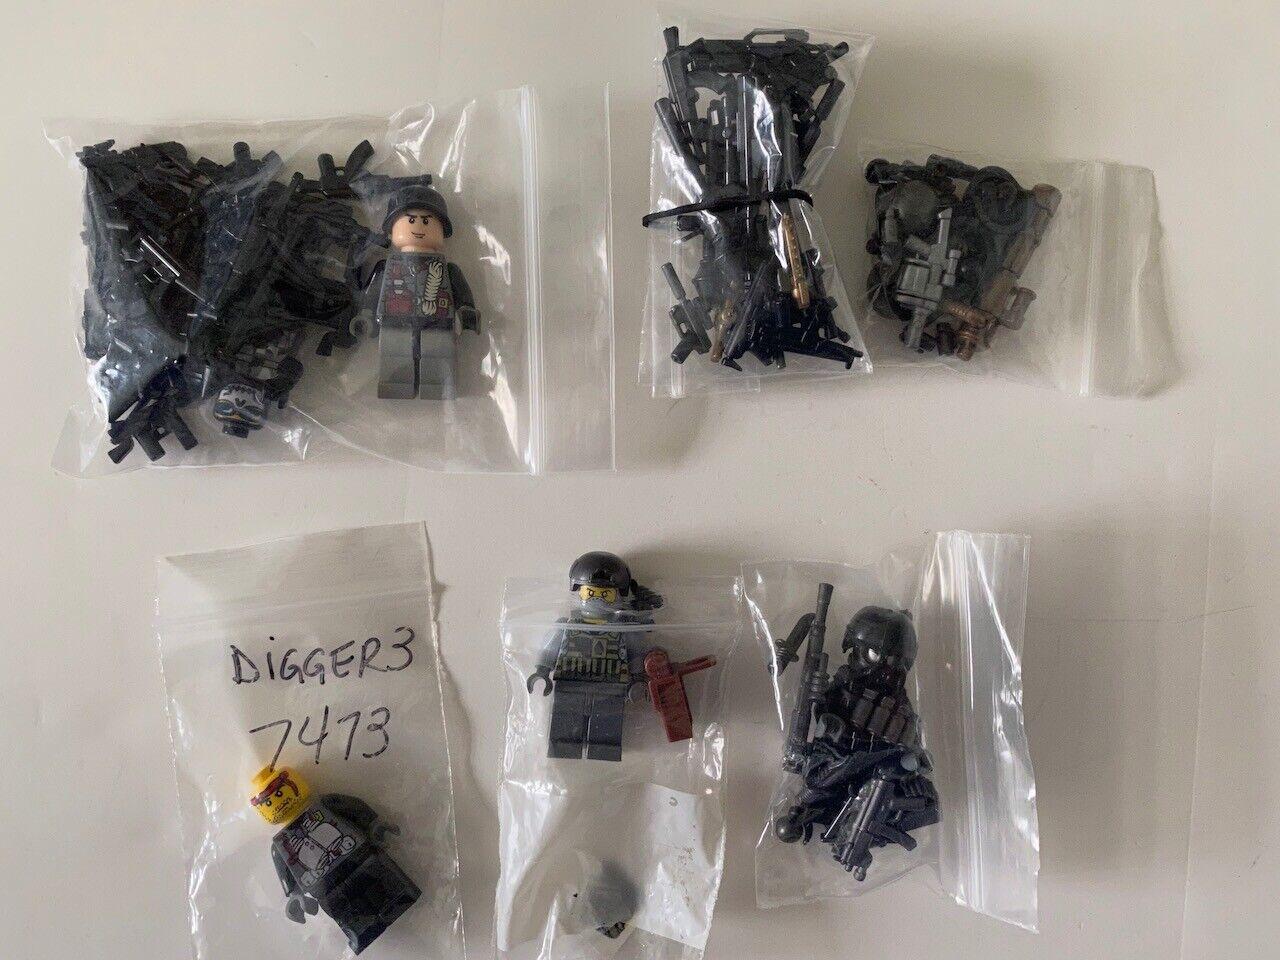 Brickarms Mini Guns & Mini Weapons Lot for Lego Mini Figures